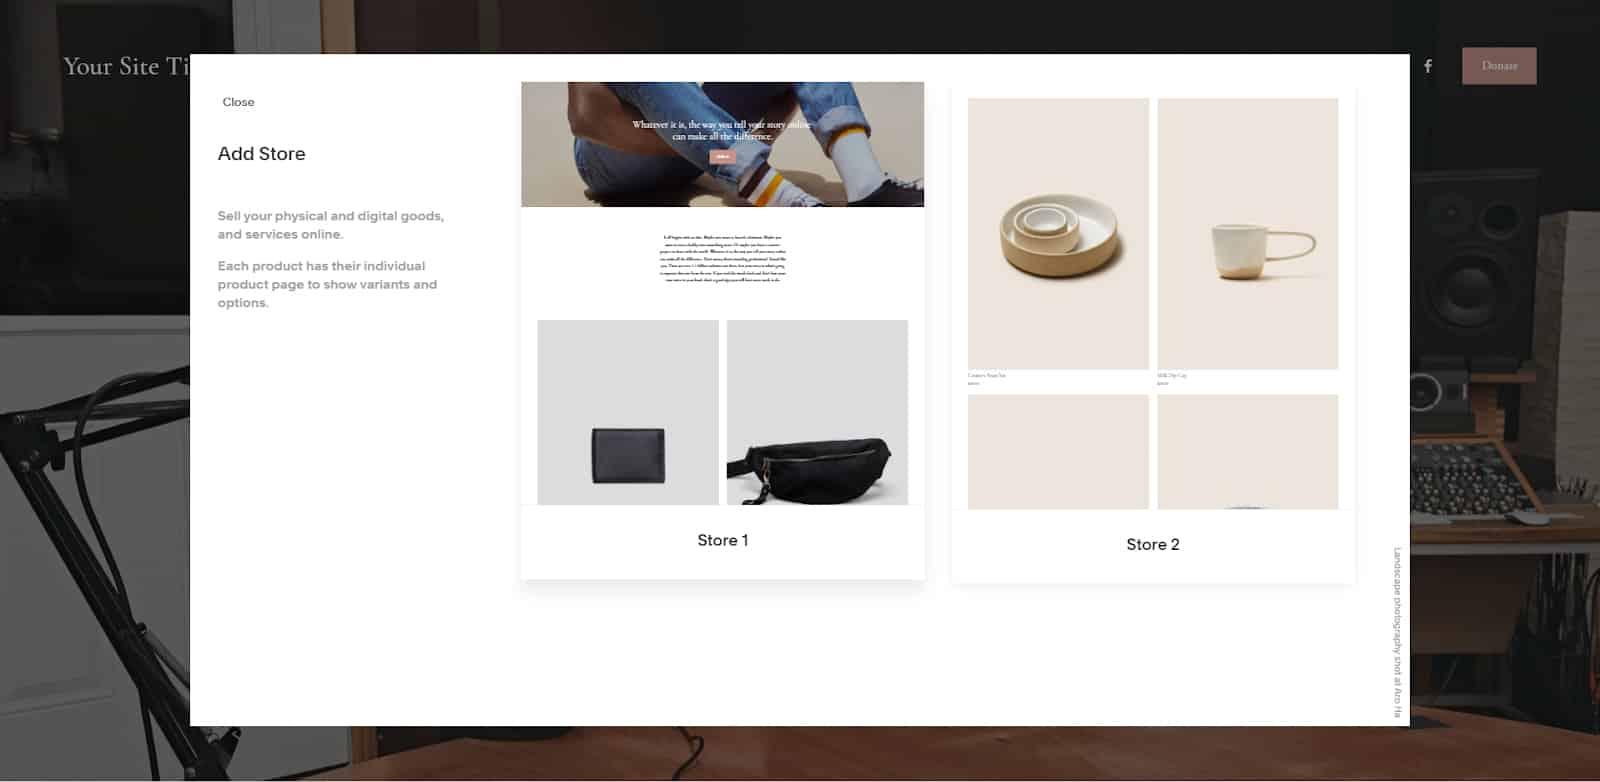 Screenshot of Squarespace add store